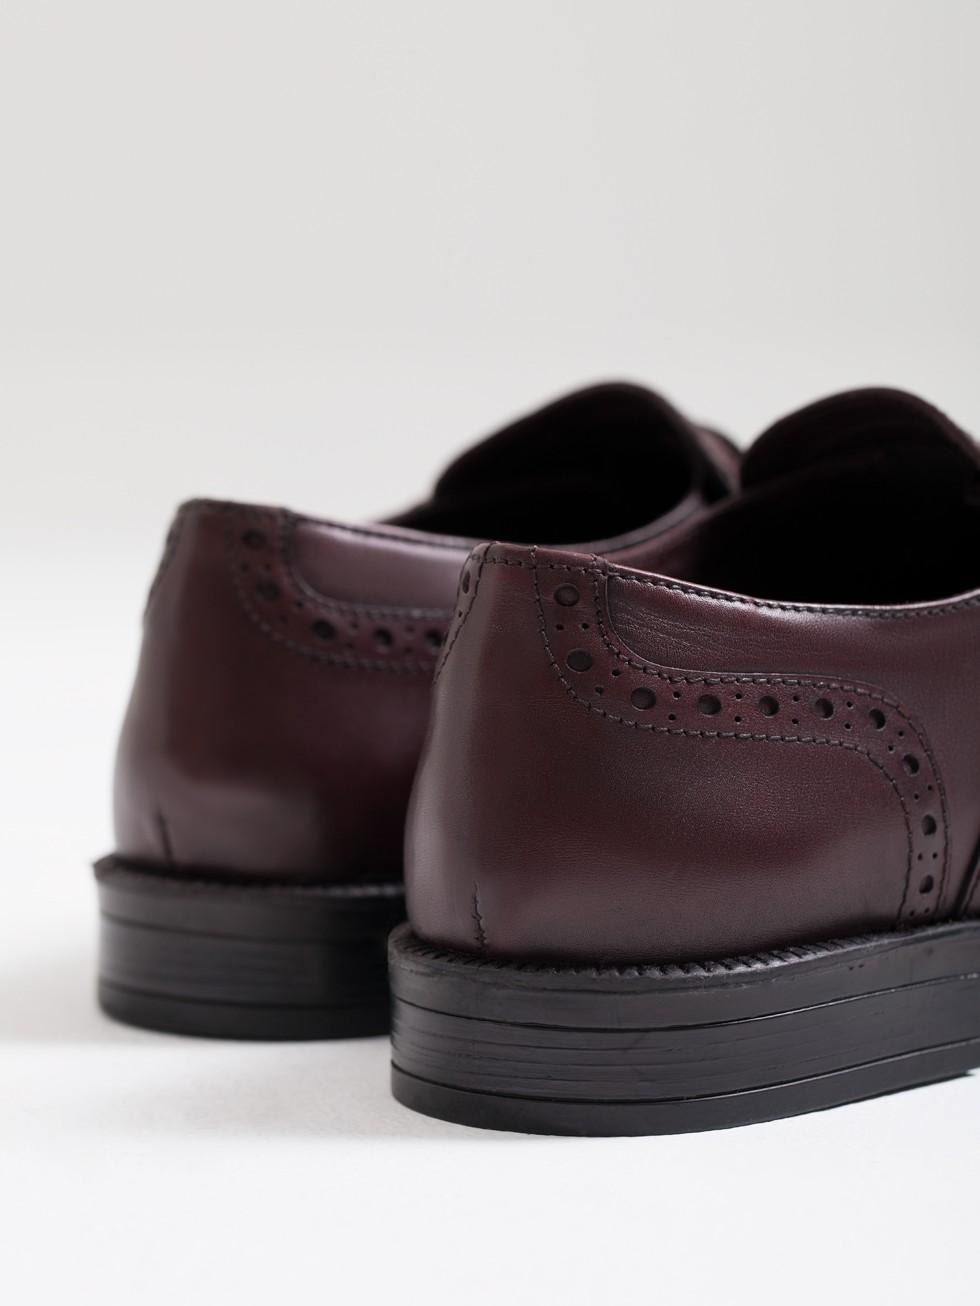 7a0a300fc6 Zapato hombre flecos piel burdeos PuroEGO